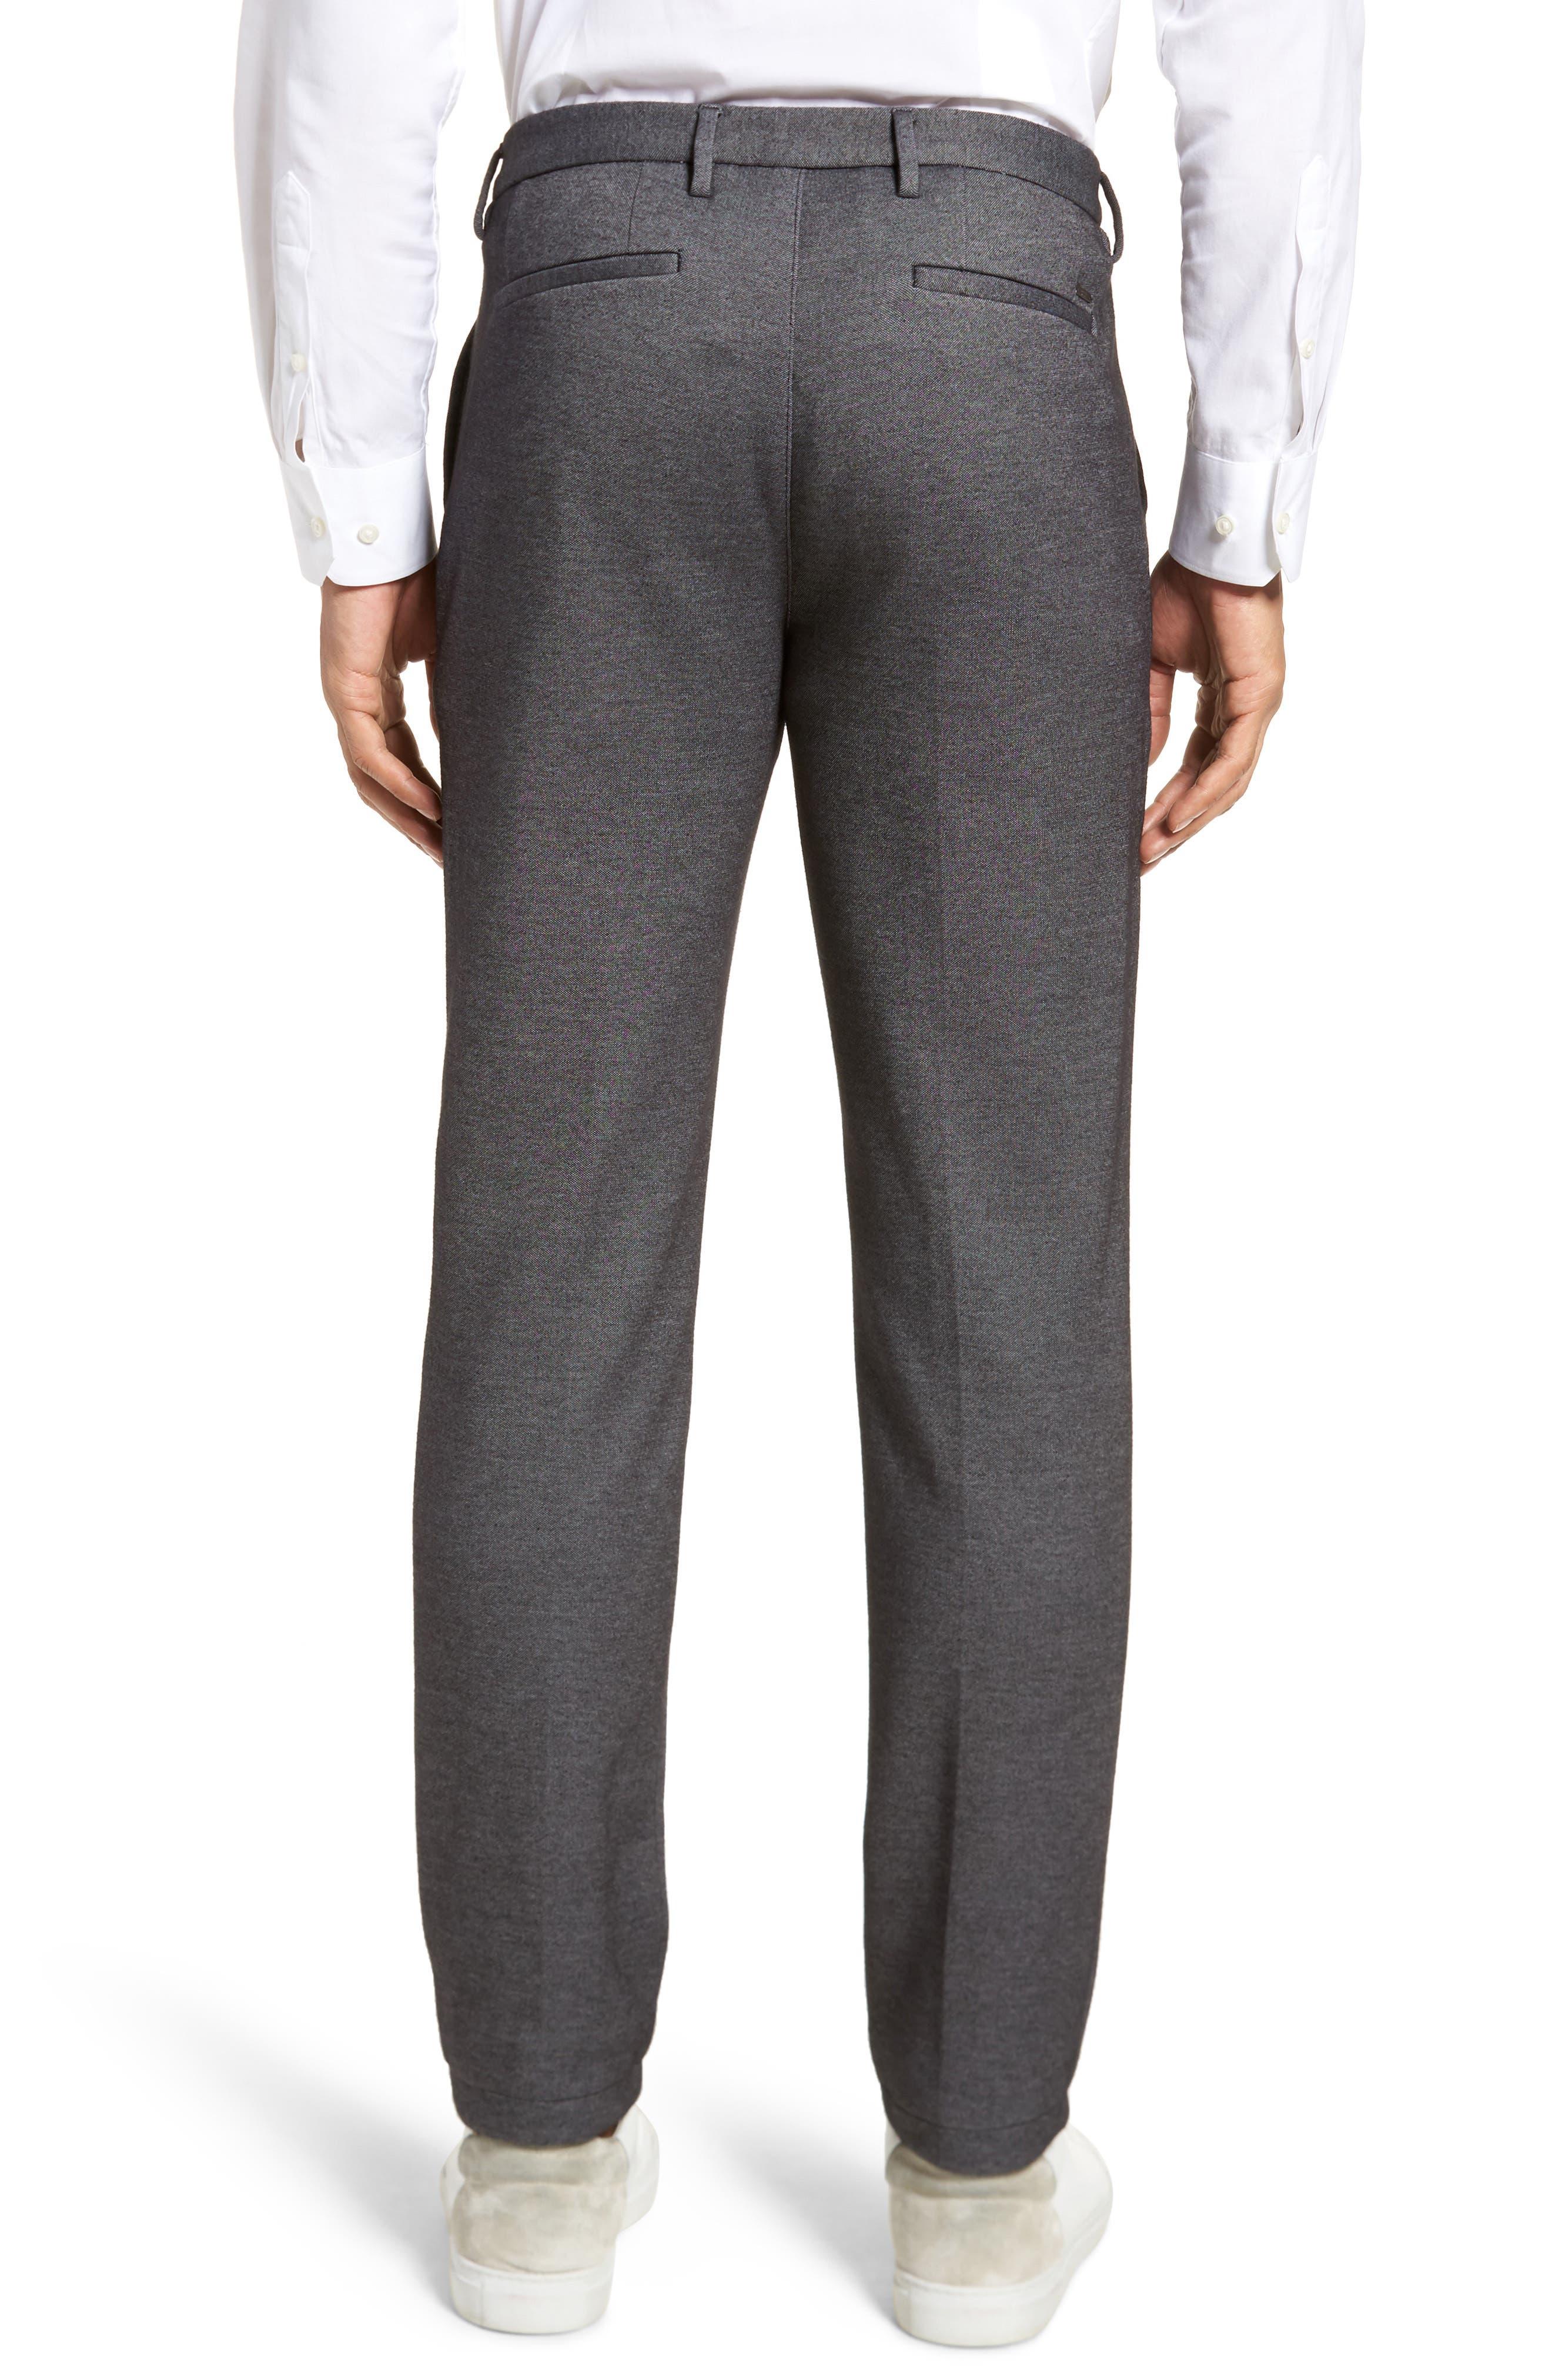 Kaito Melange Cotton Blend Pants,                             Alternate thumbnail 2, color,                             030